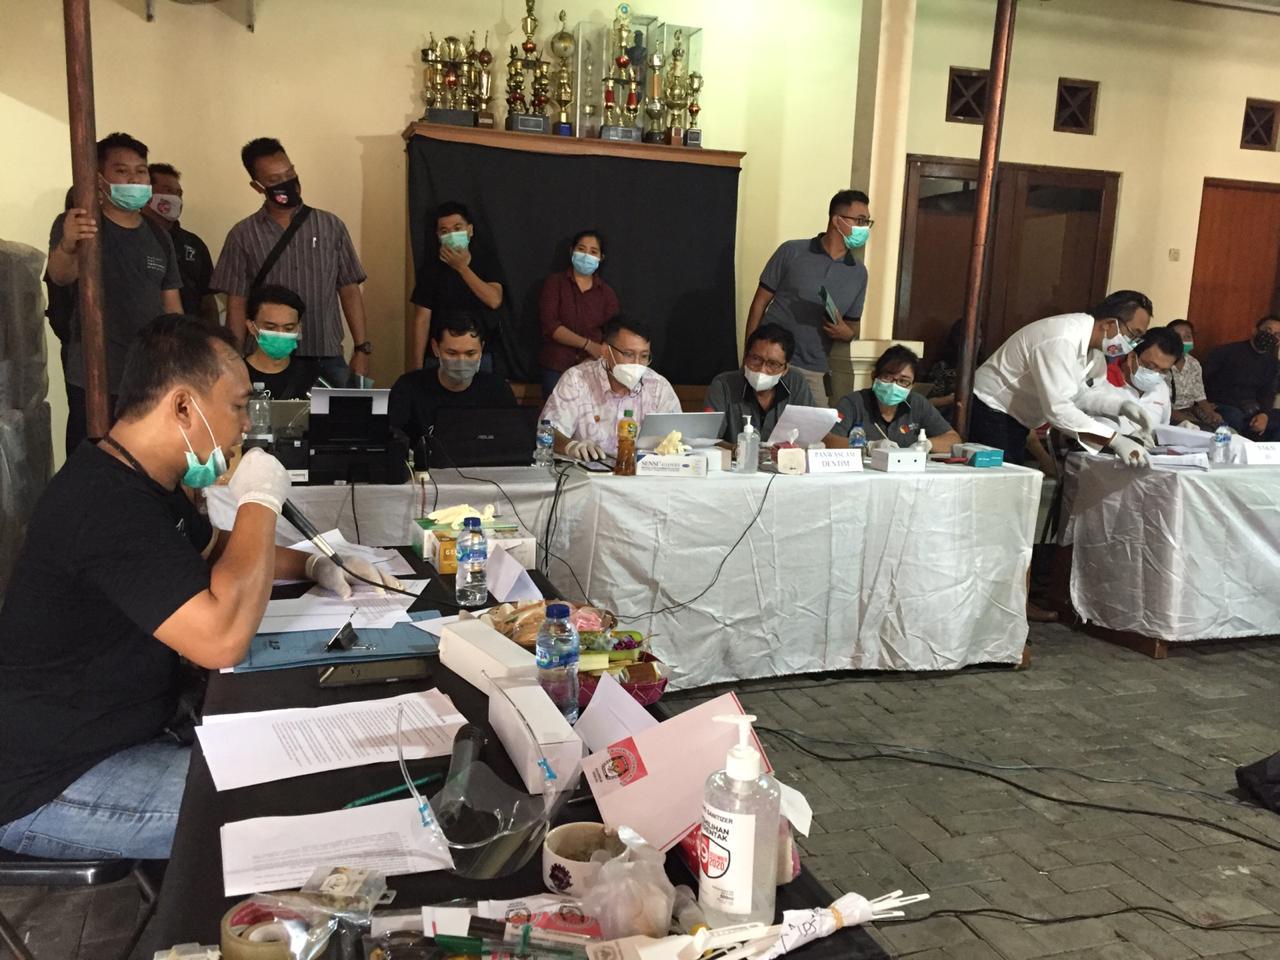 PROSES pleno rekapitulasi di salah satu kecamatan di Denpasar. Tidak adanya pelanggaran saat proses rekapitulasi membuat Bawaslu Bali yakin kecil kemungkinan peluang hasil Pilkada 2020 di Bali berlanjut ke Mahkamah Konstitusi. Foto: ist